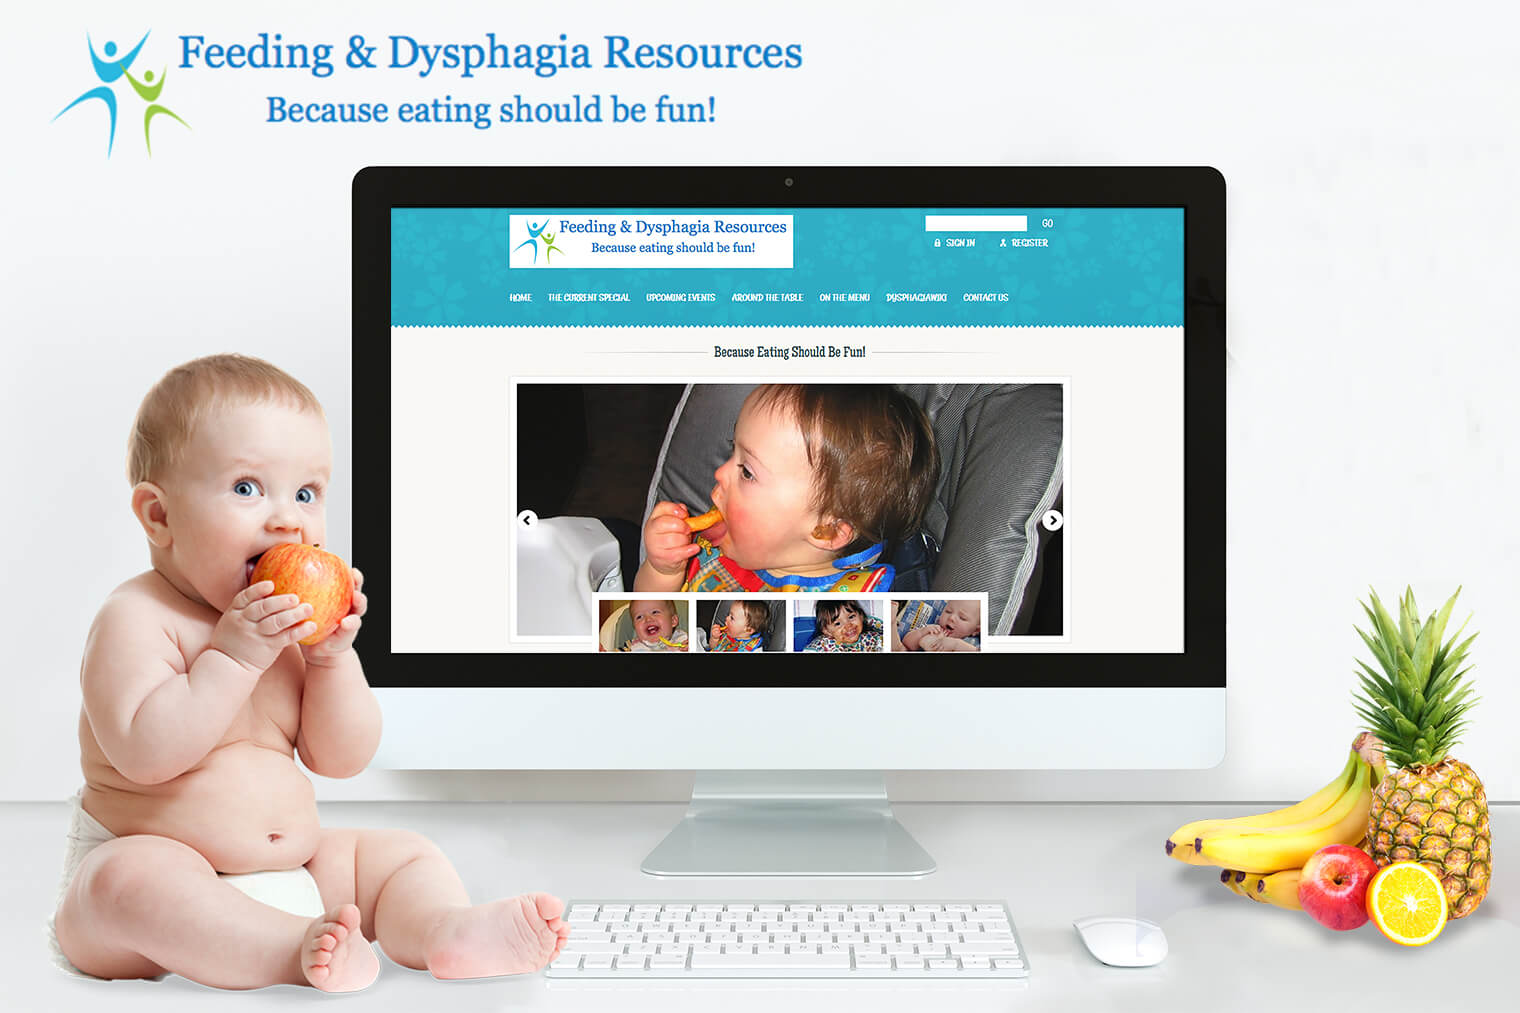 Feeding and Dysphagia Resources